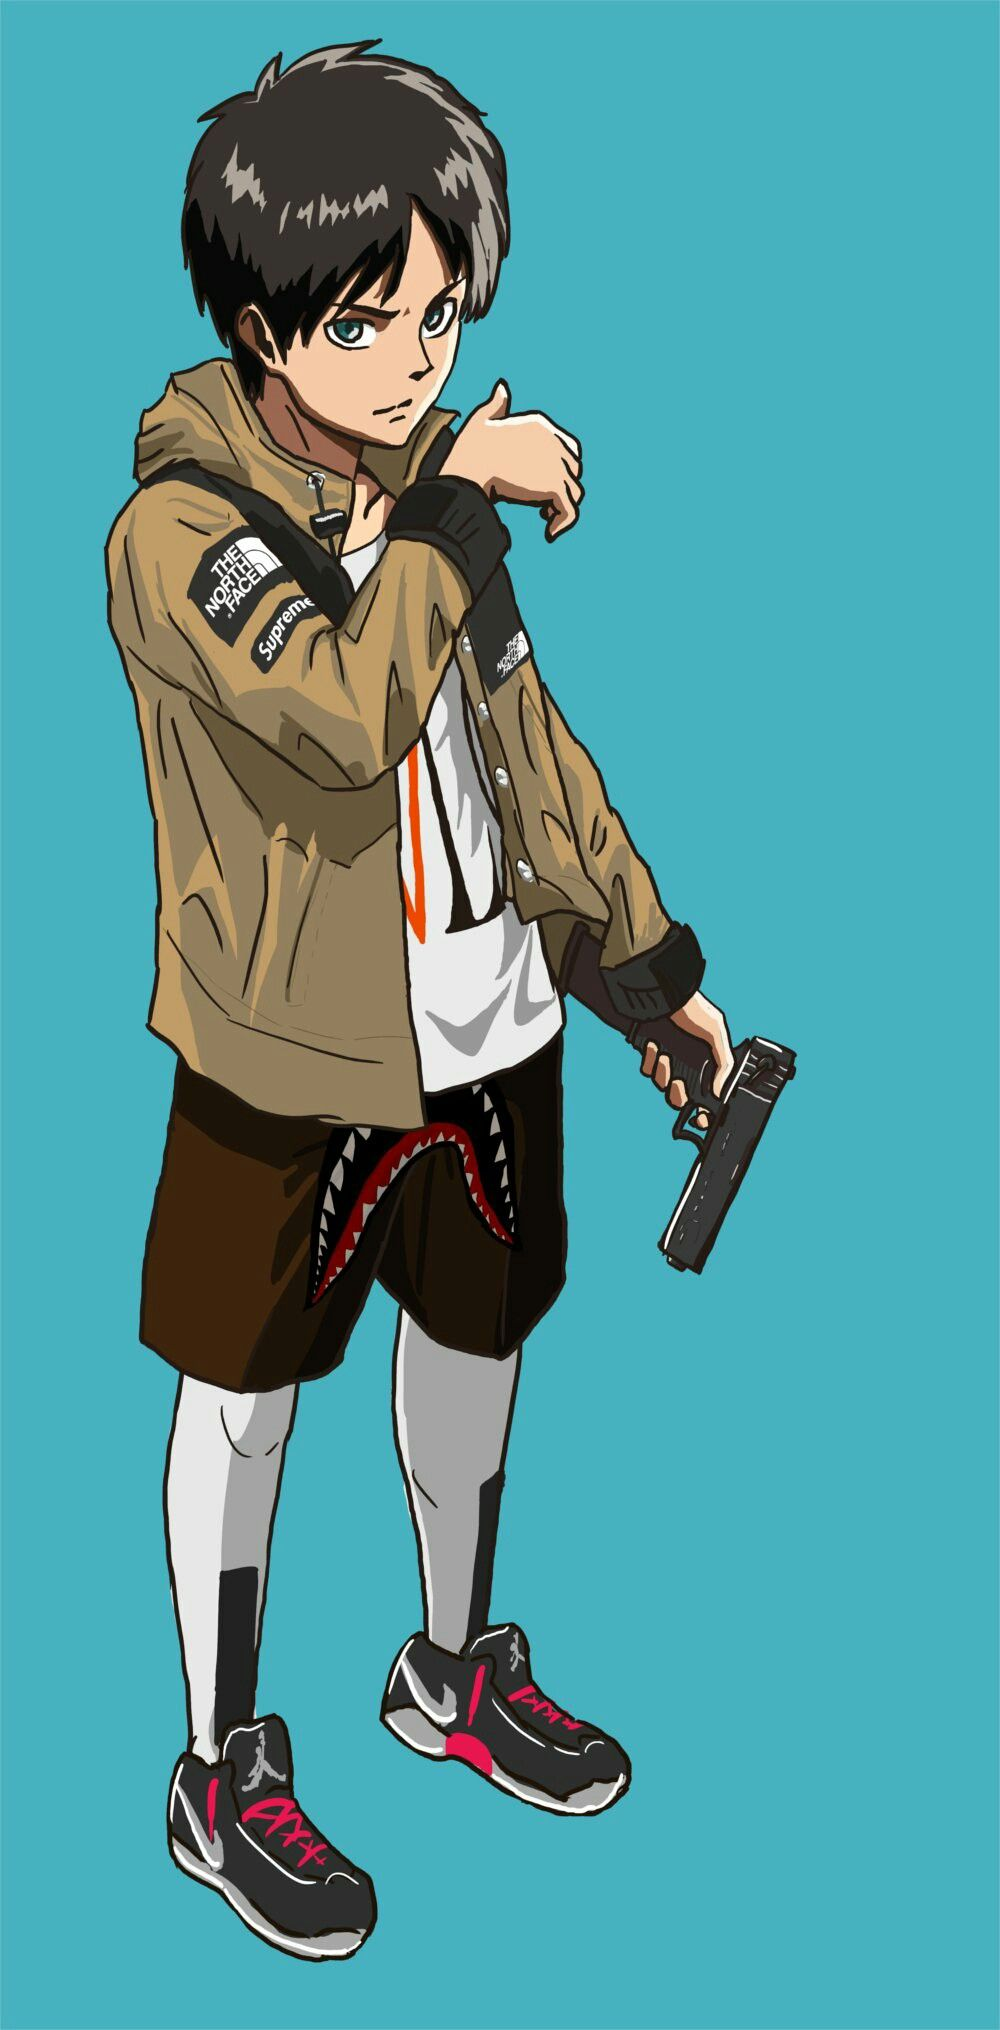 Shingeki no Kyojin Eren x TNF sauce Anime art Anime Dope 1000x2030